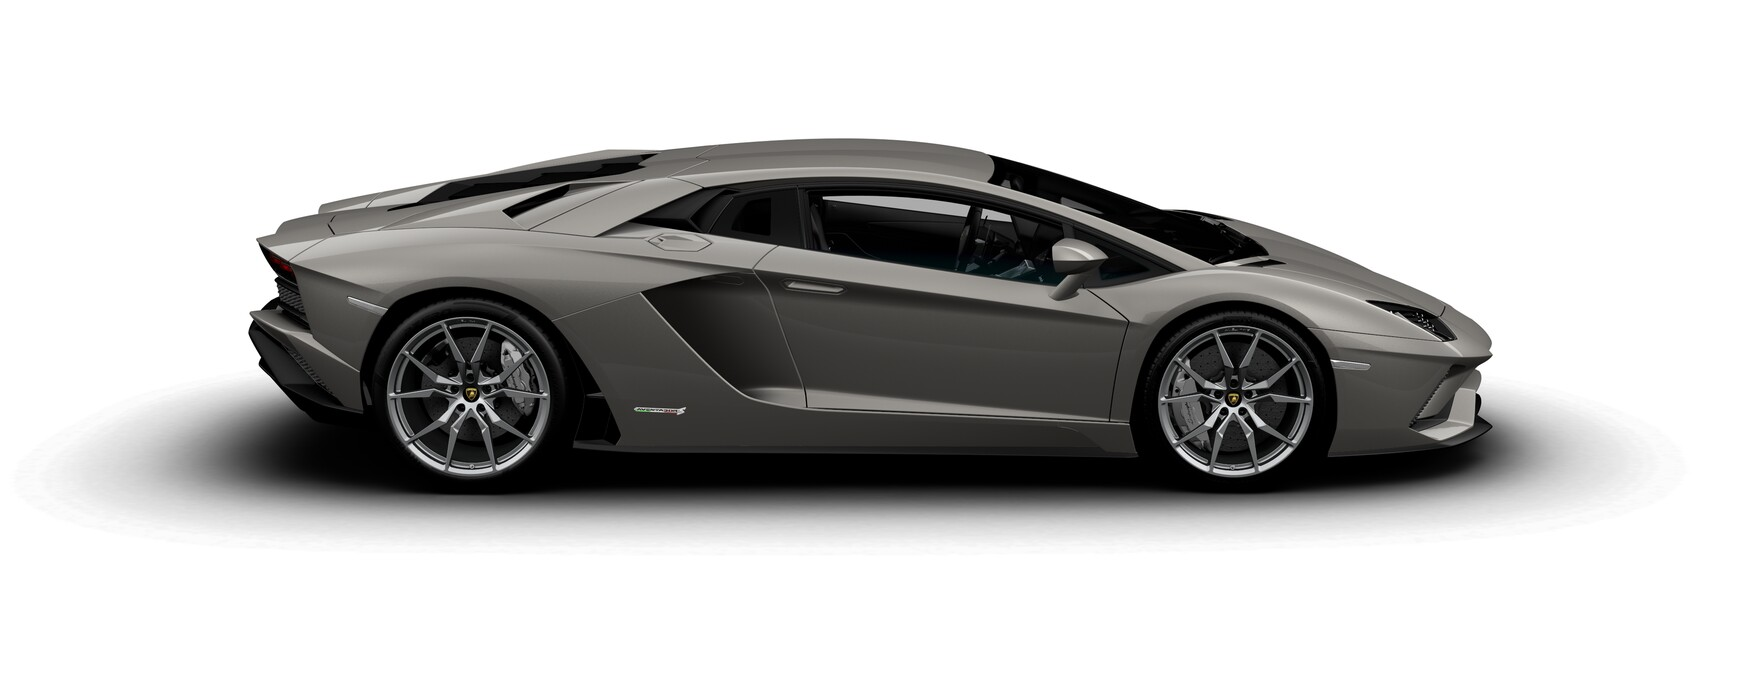 Lamborghini Aventador S Coupe metallic Grigio Antares side view